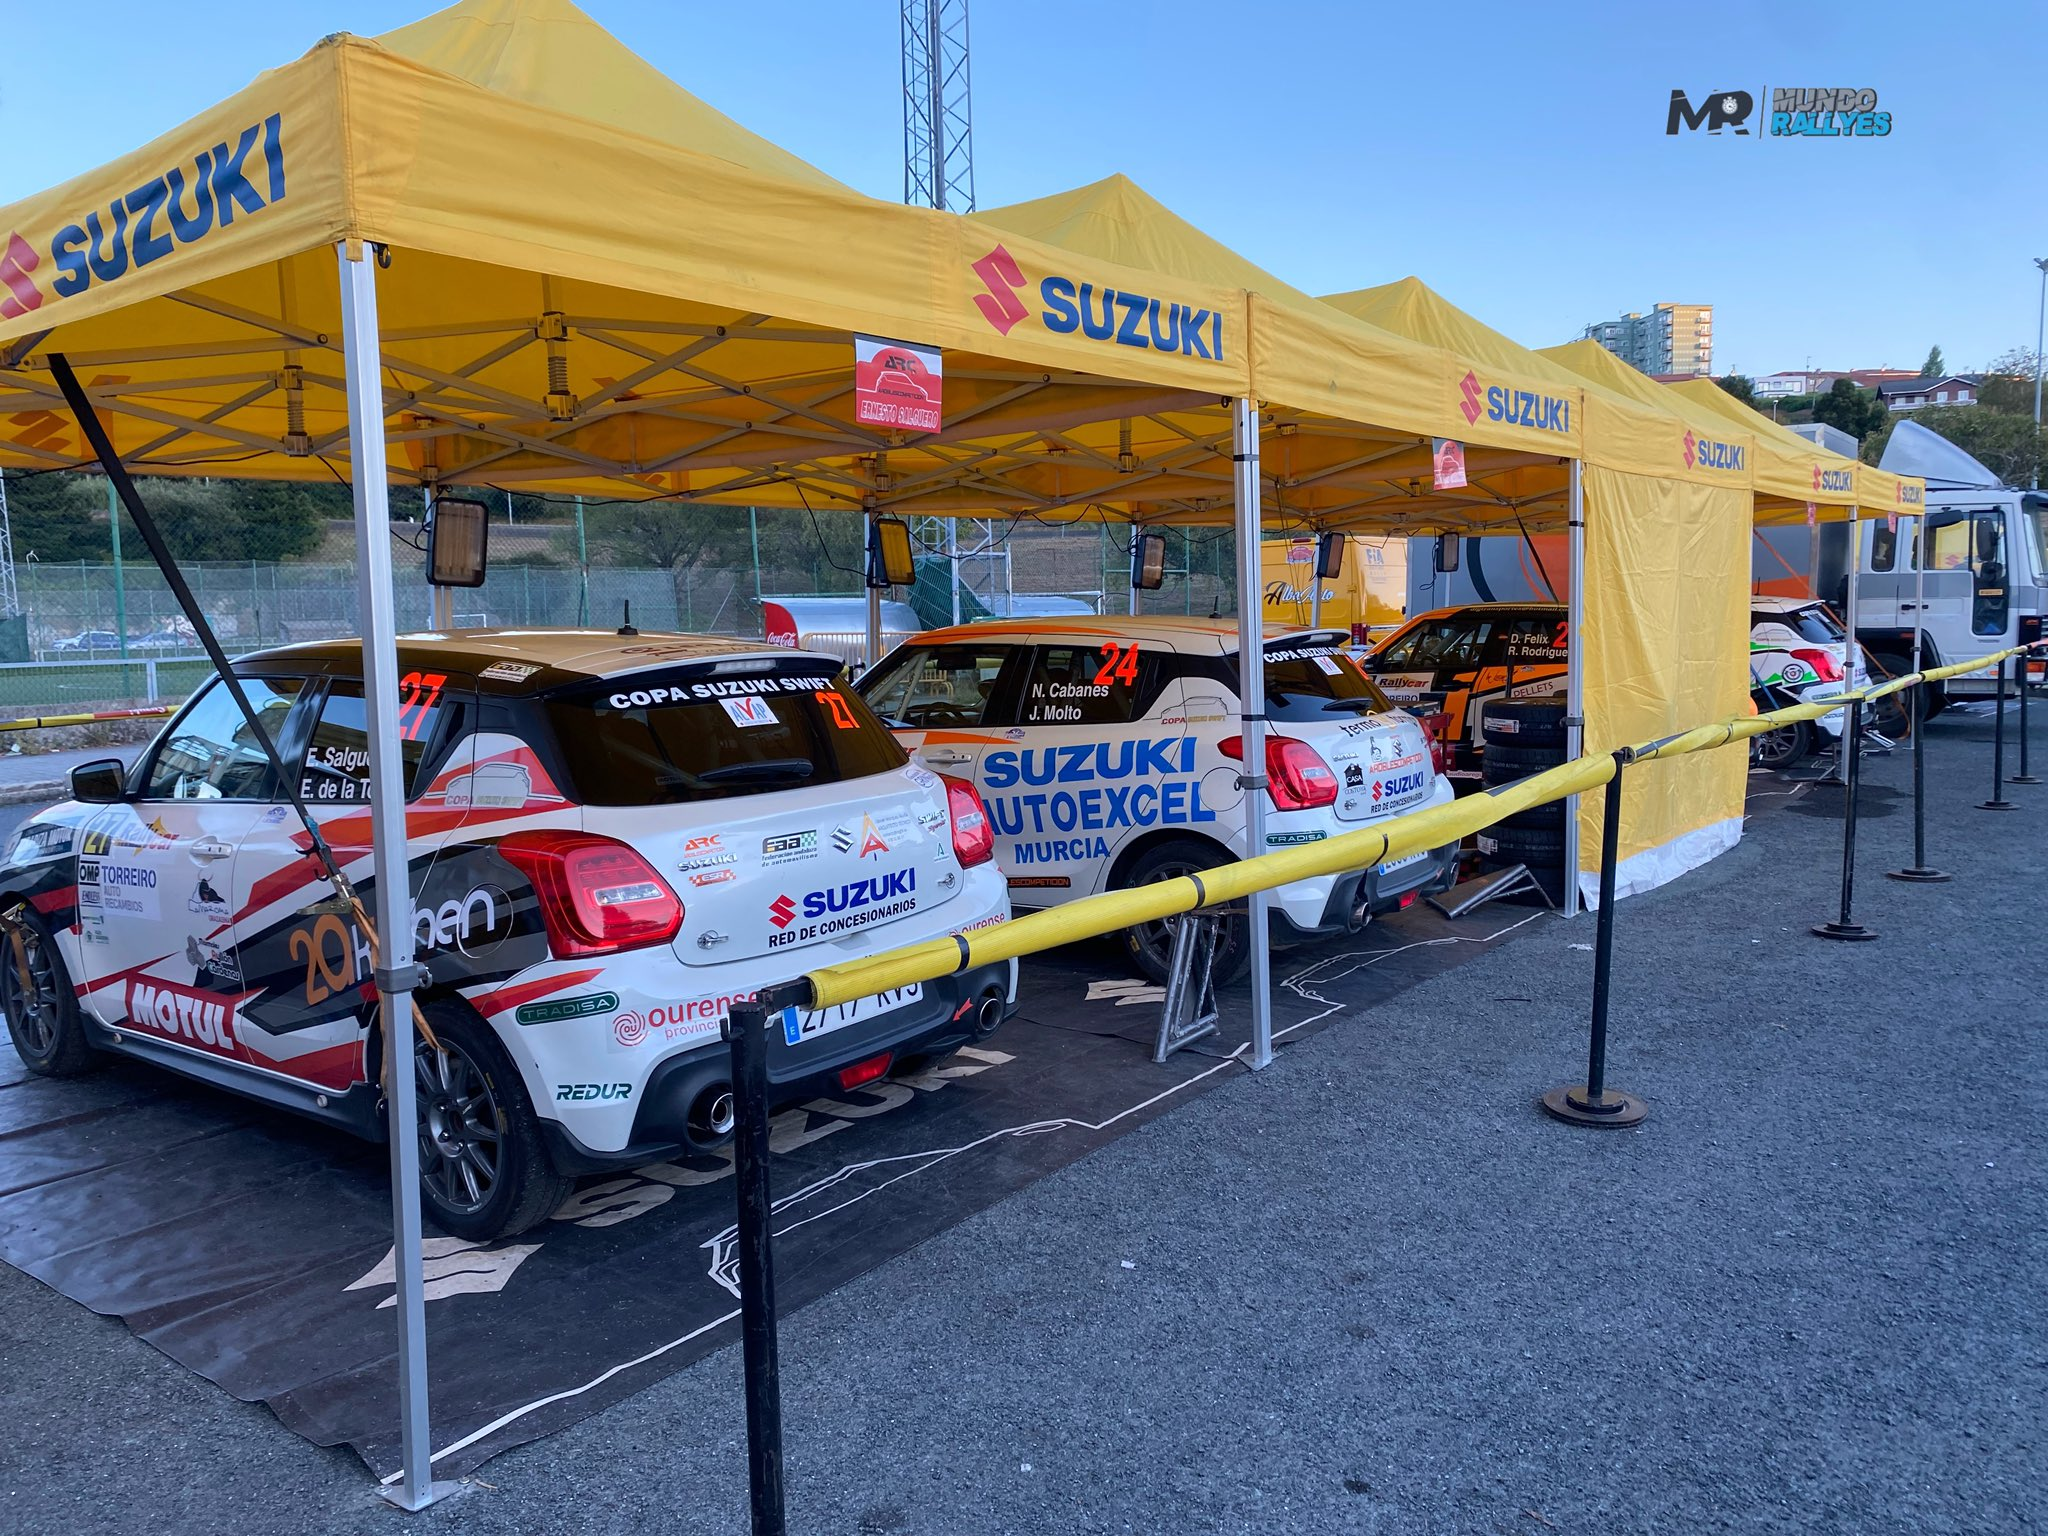 SCER + TER: 52º Rallye de Ferrol - Suzuki [20-21 Agosto] E9LZjg3WUAsD_-1?format=jpg&name=large